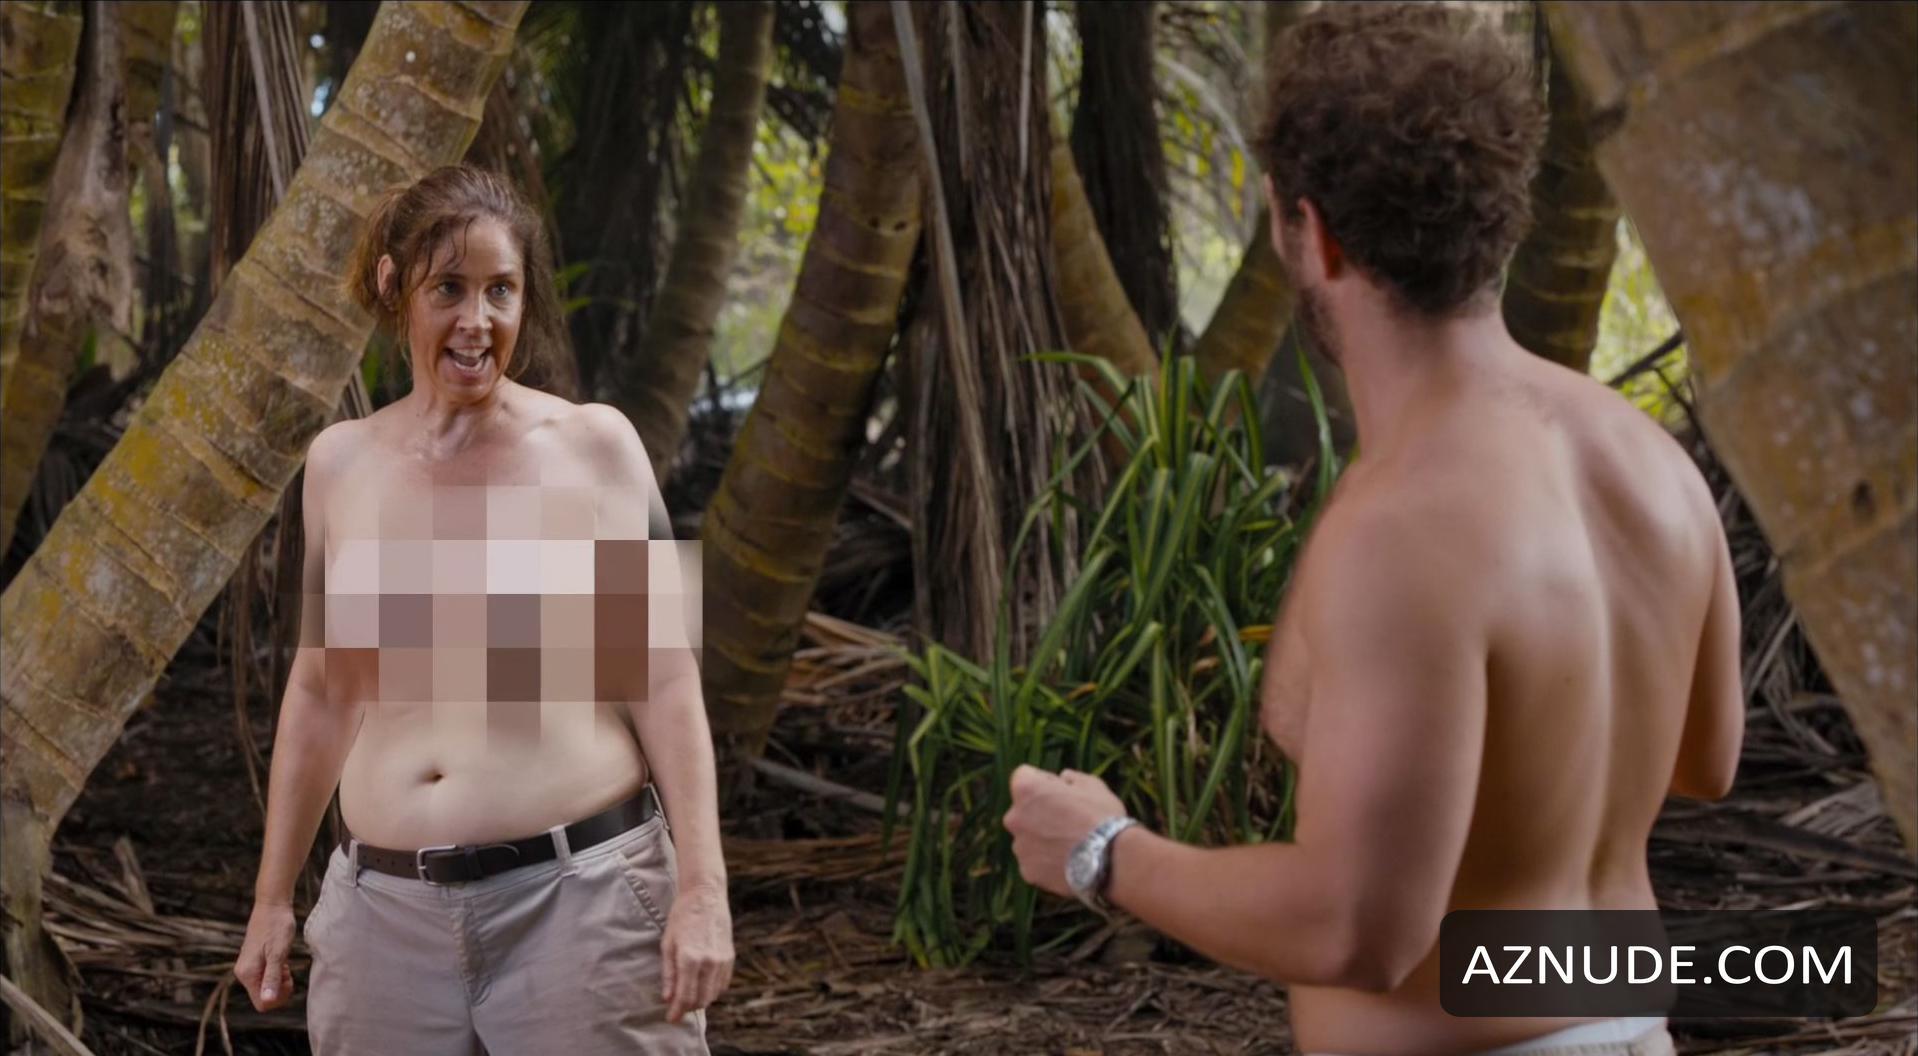 Nude Brooke dillman